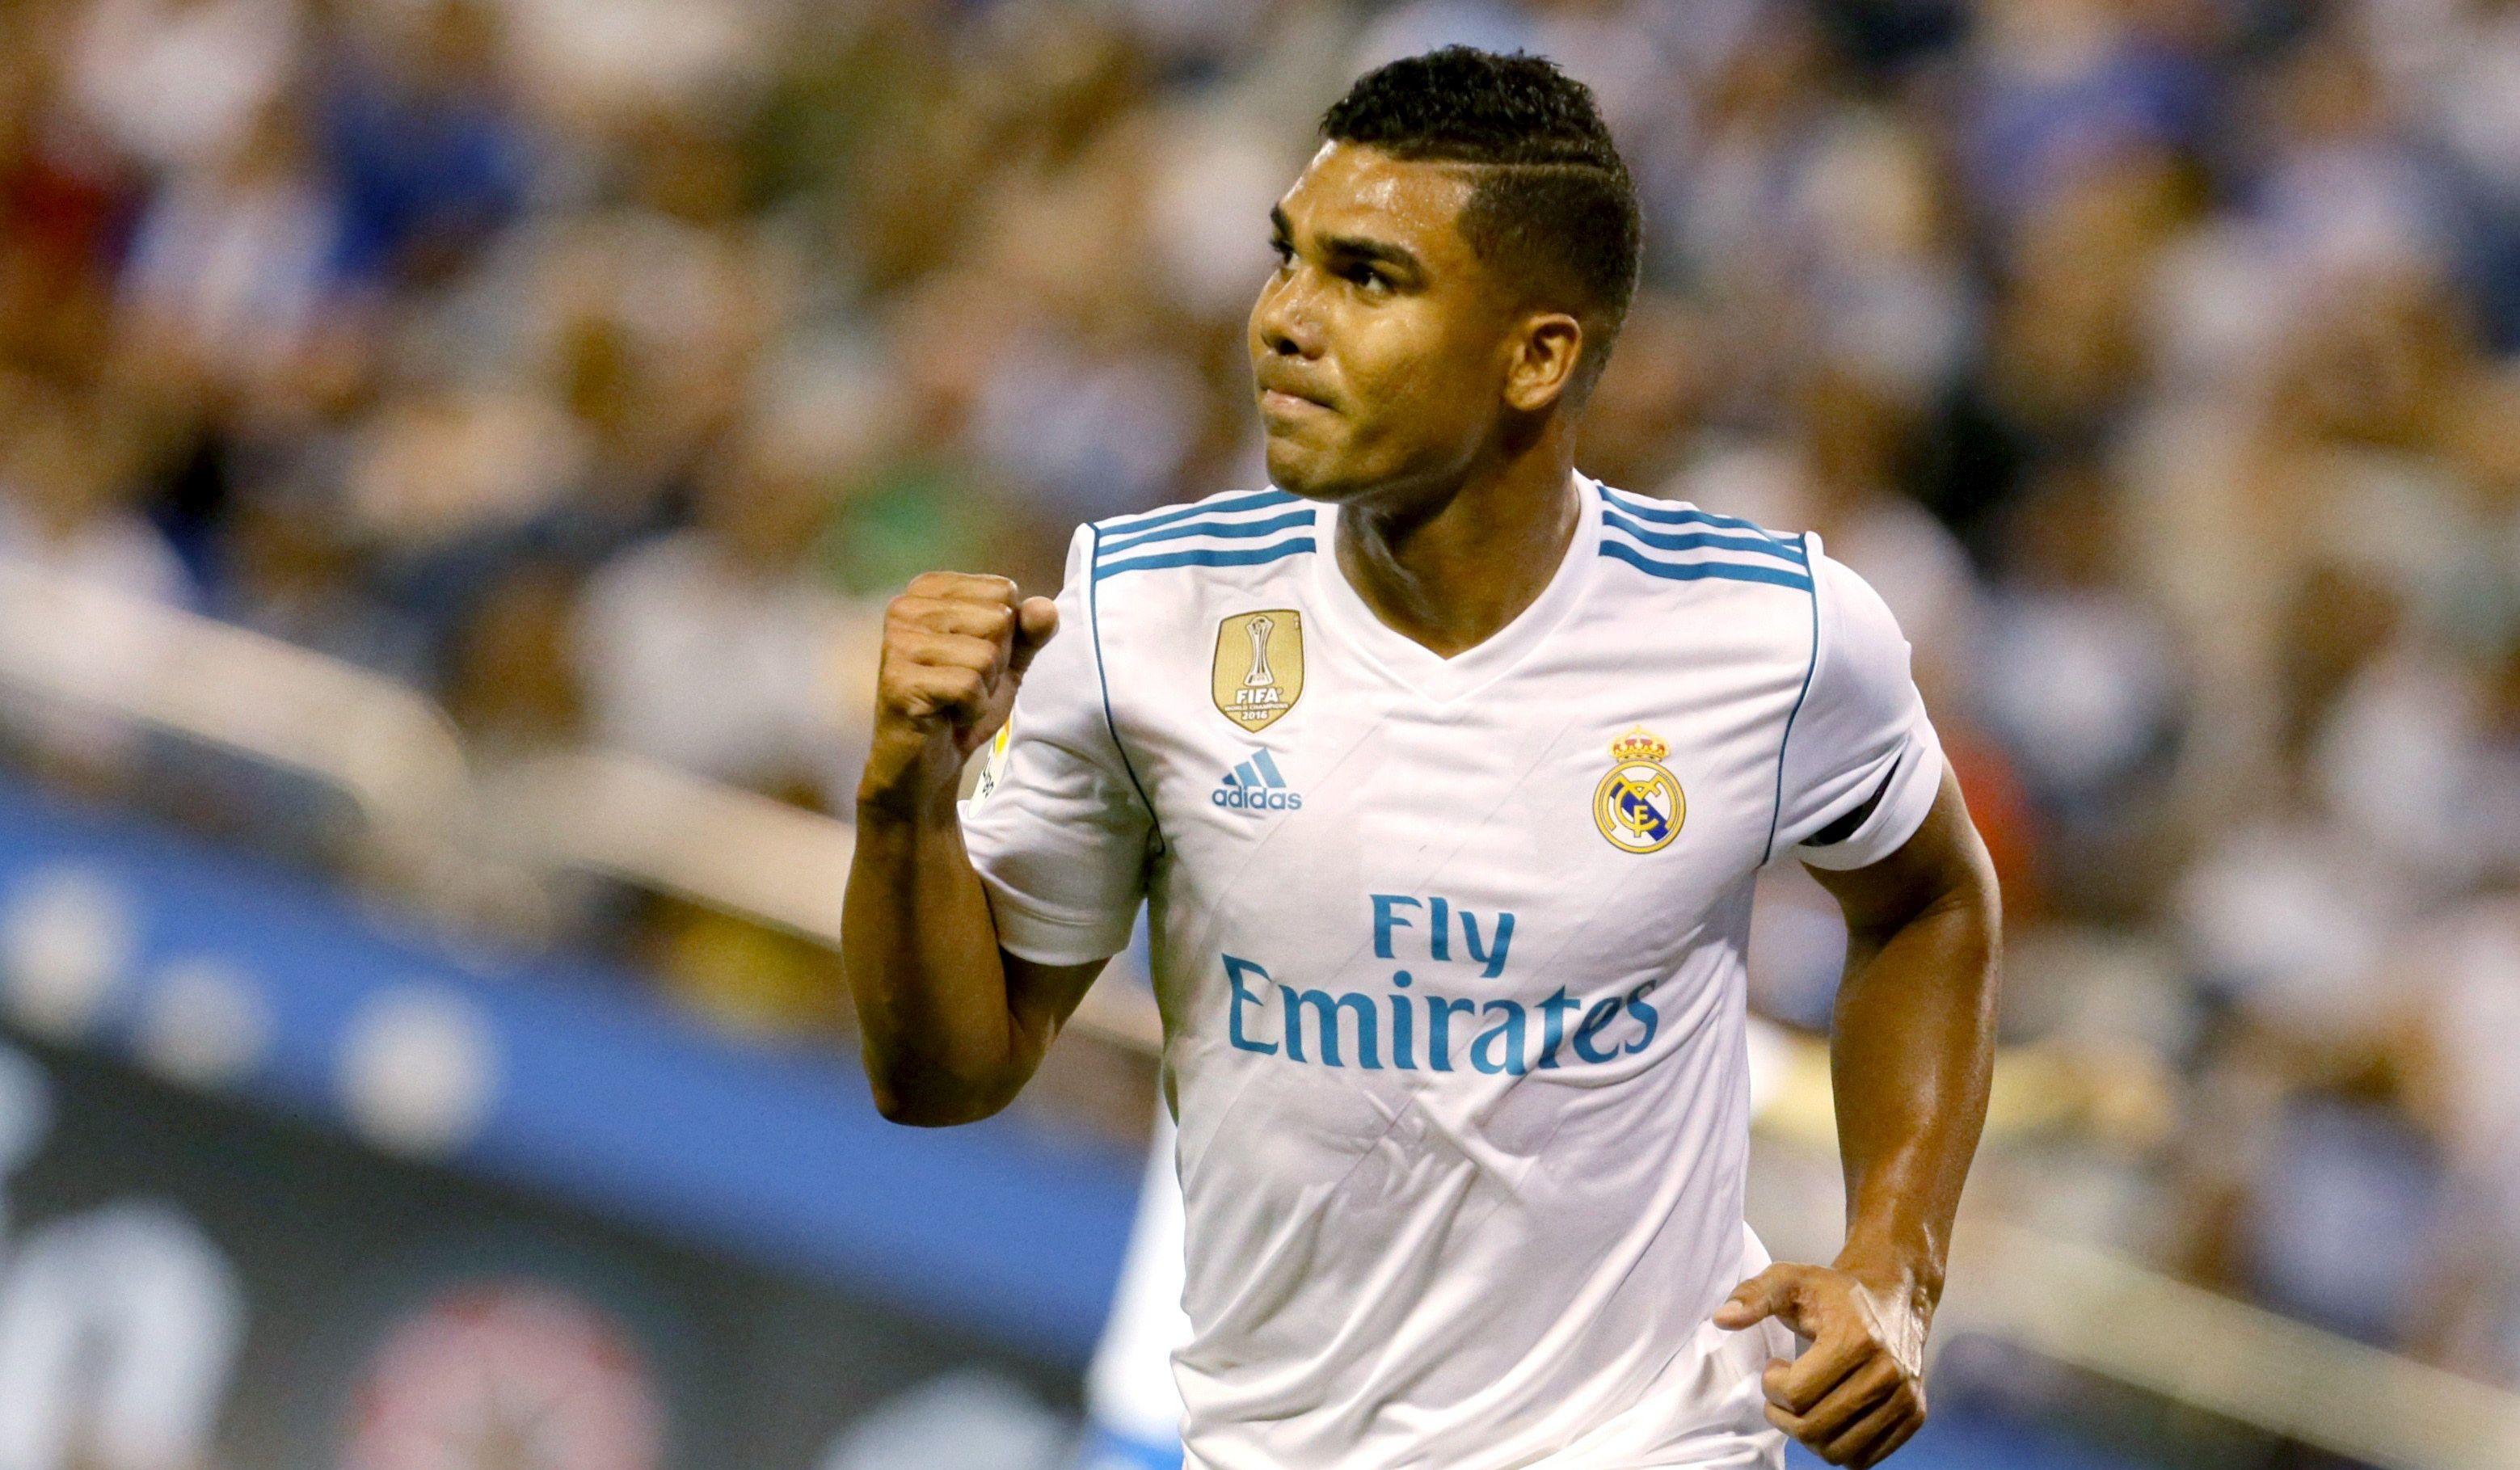 ŠPANJOLSKA Deportivo – Real Madrid 0-3